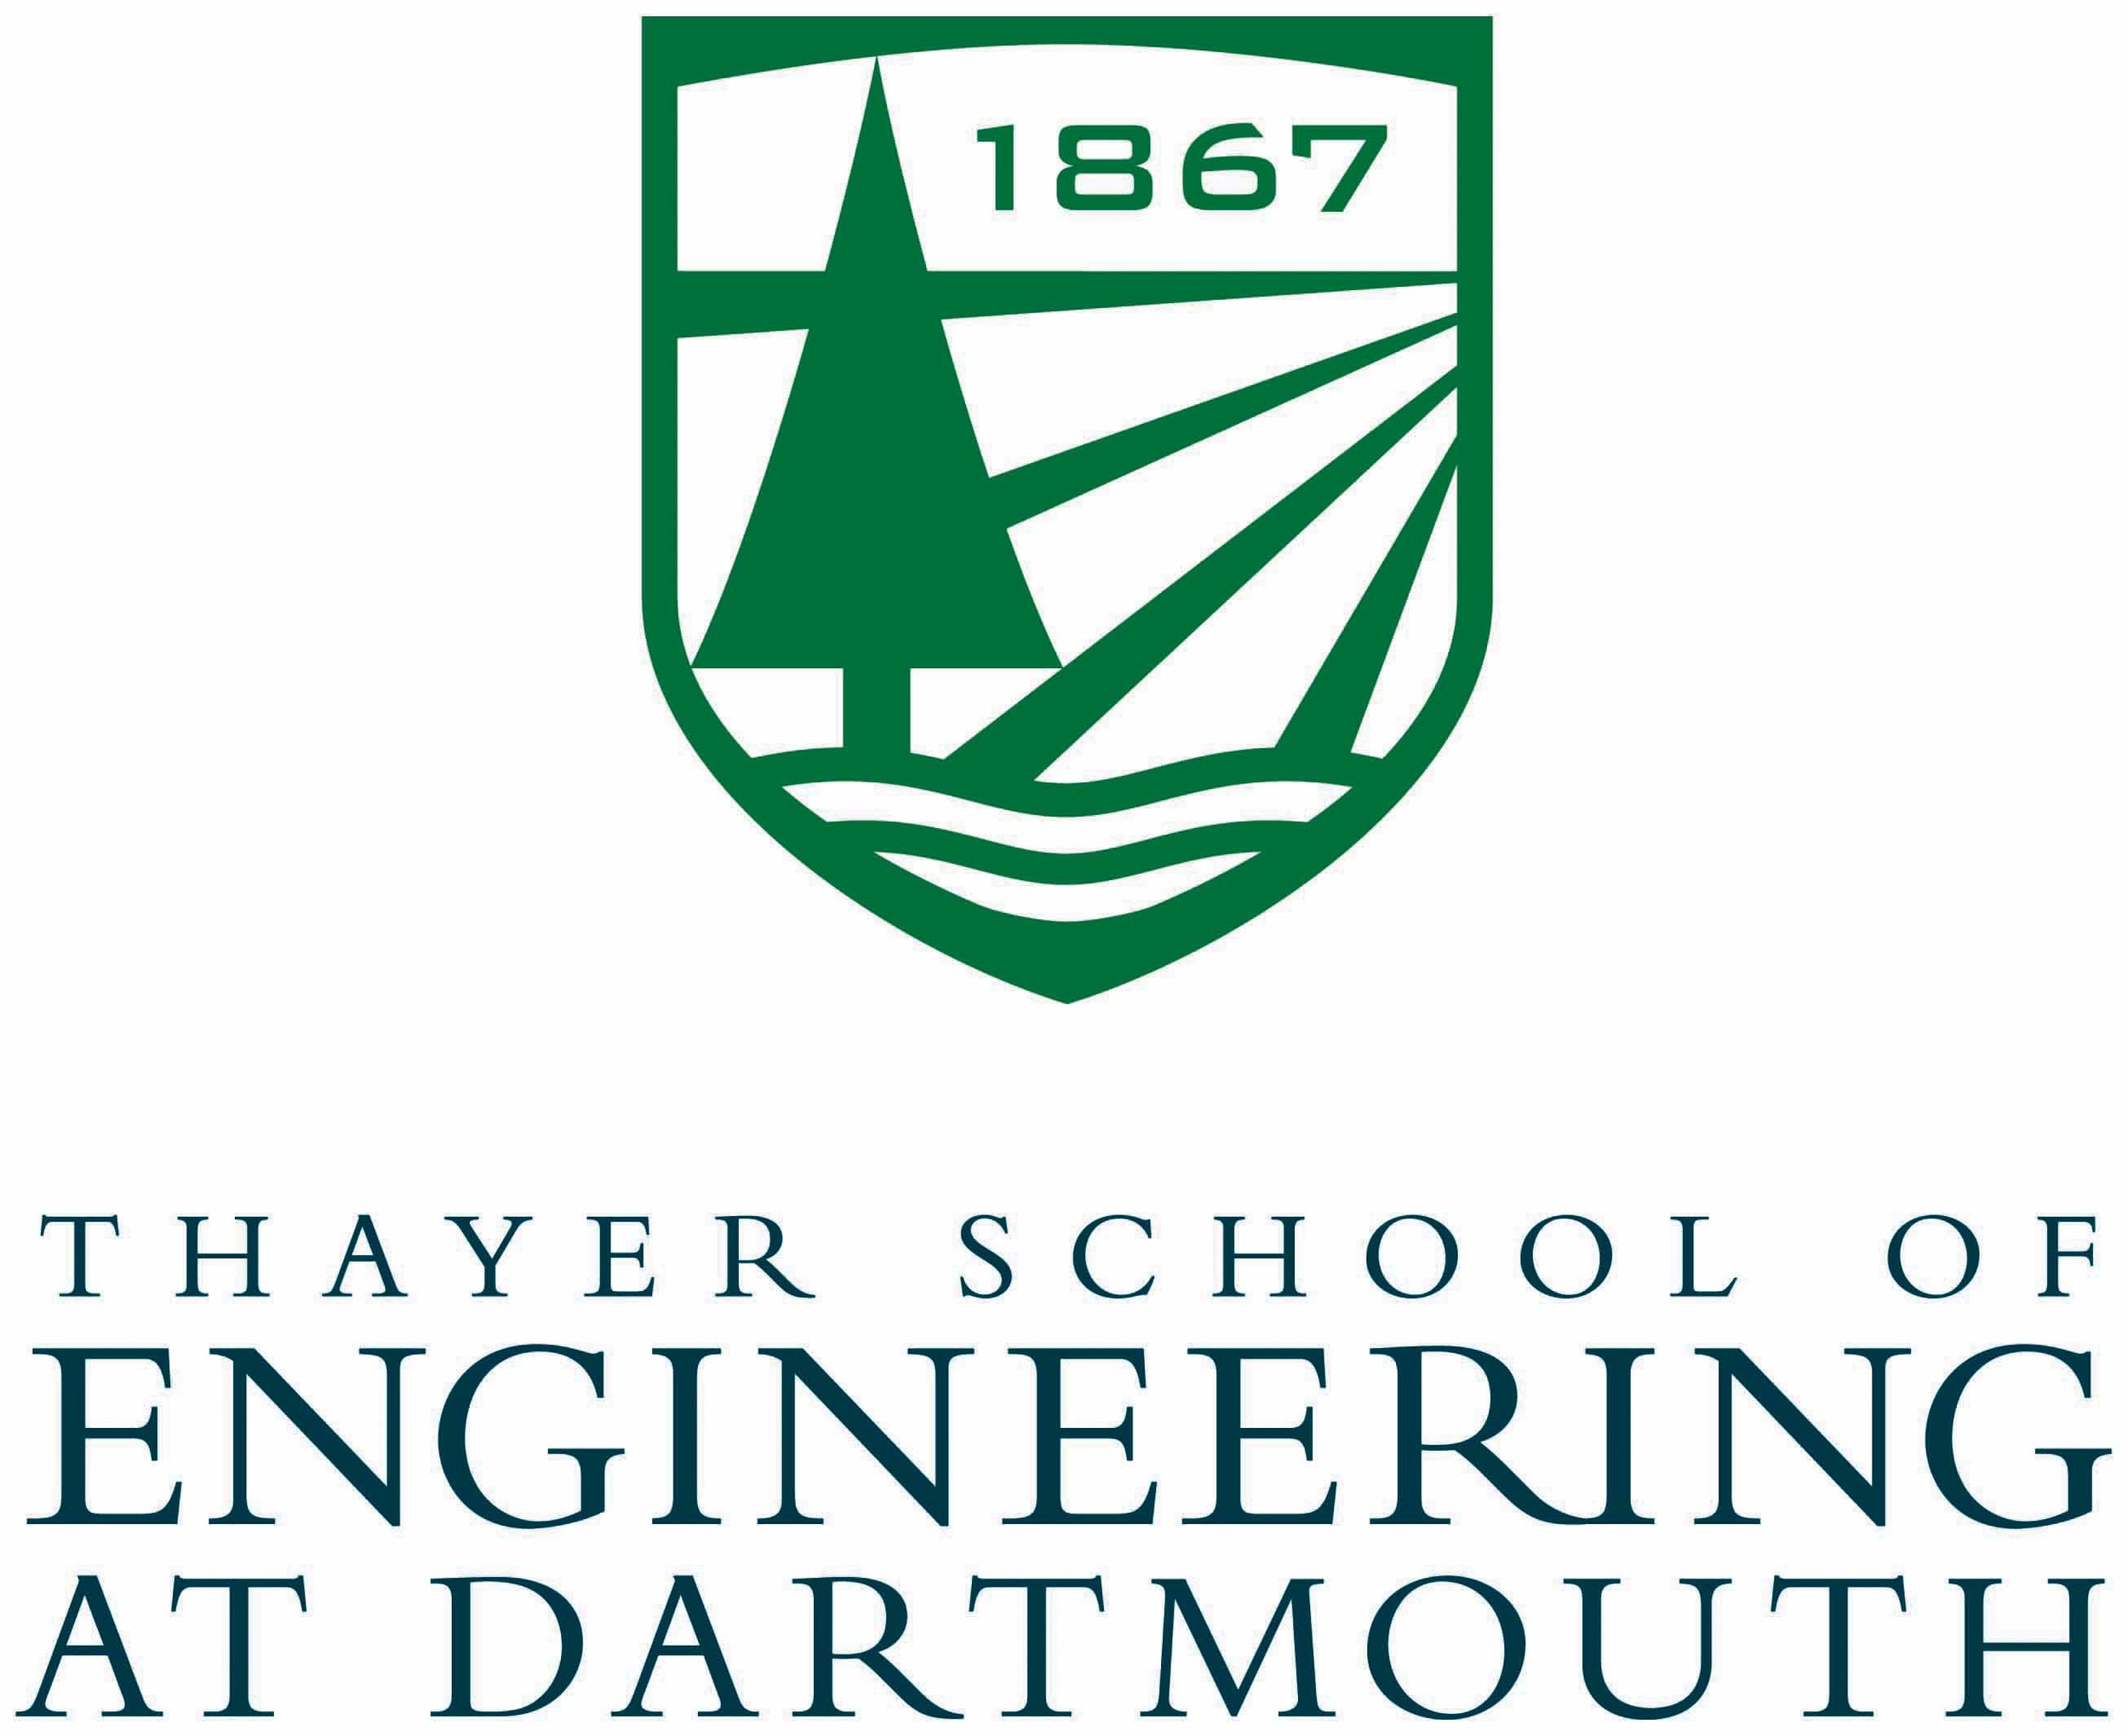 Thayer-School-of-Engineering-at-Dartmouth-logo1.jpg